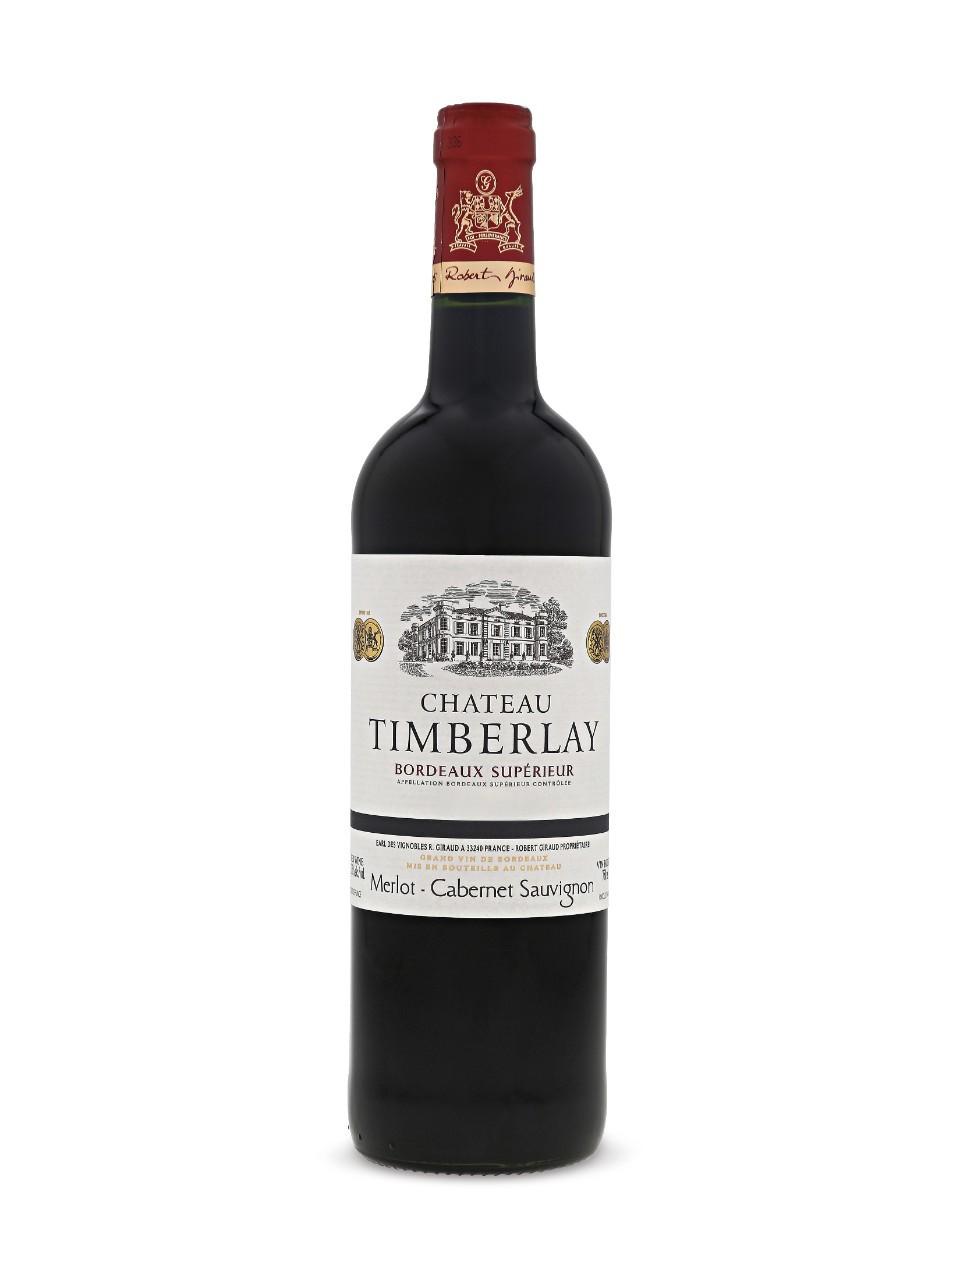 Chateau Timberlay Bordeaux Superieur Aoc Lcbo